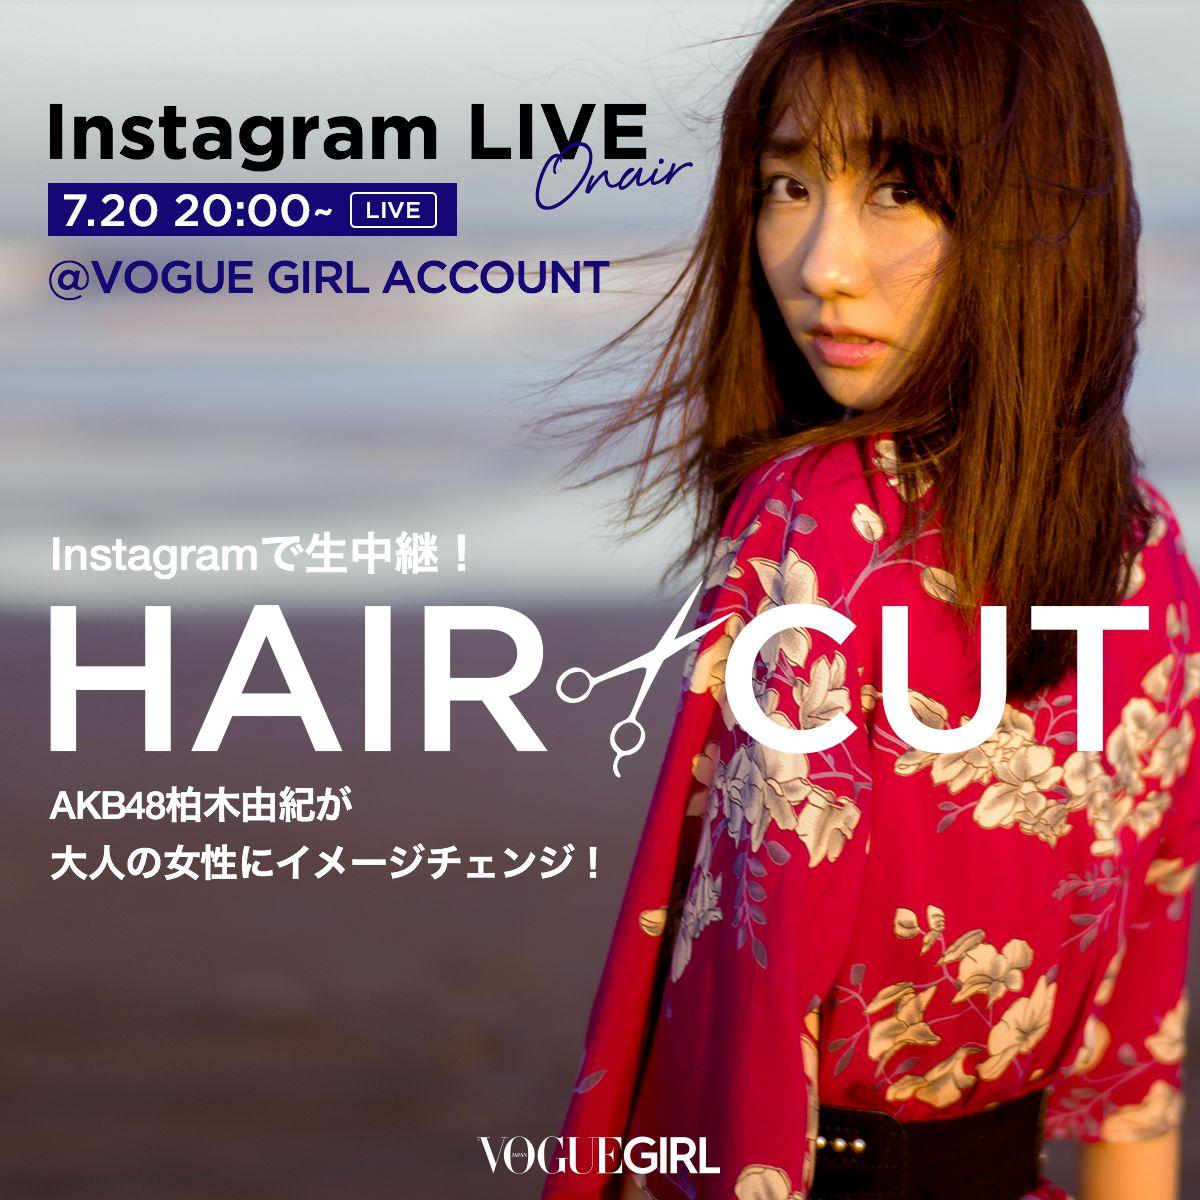 AKB48・柏木由紀が大胆ヘアカットを生中継サムネイル画像